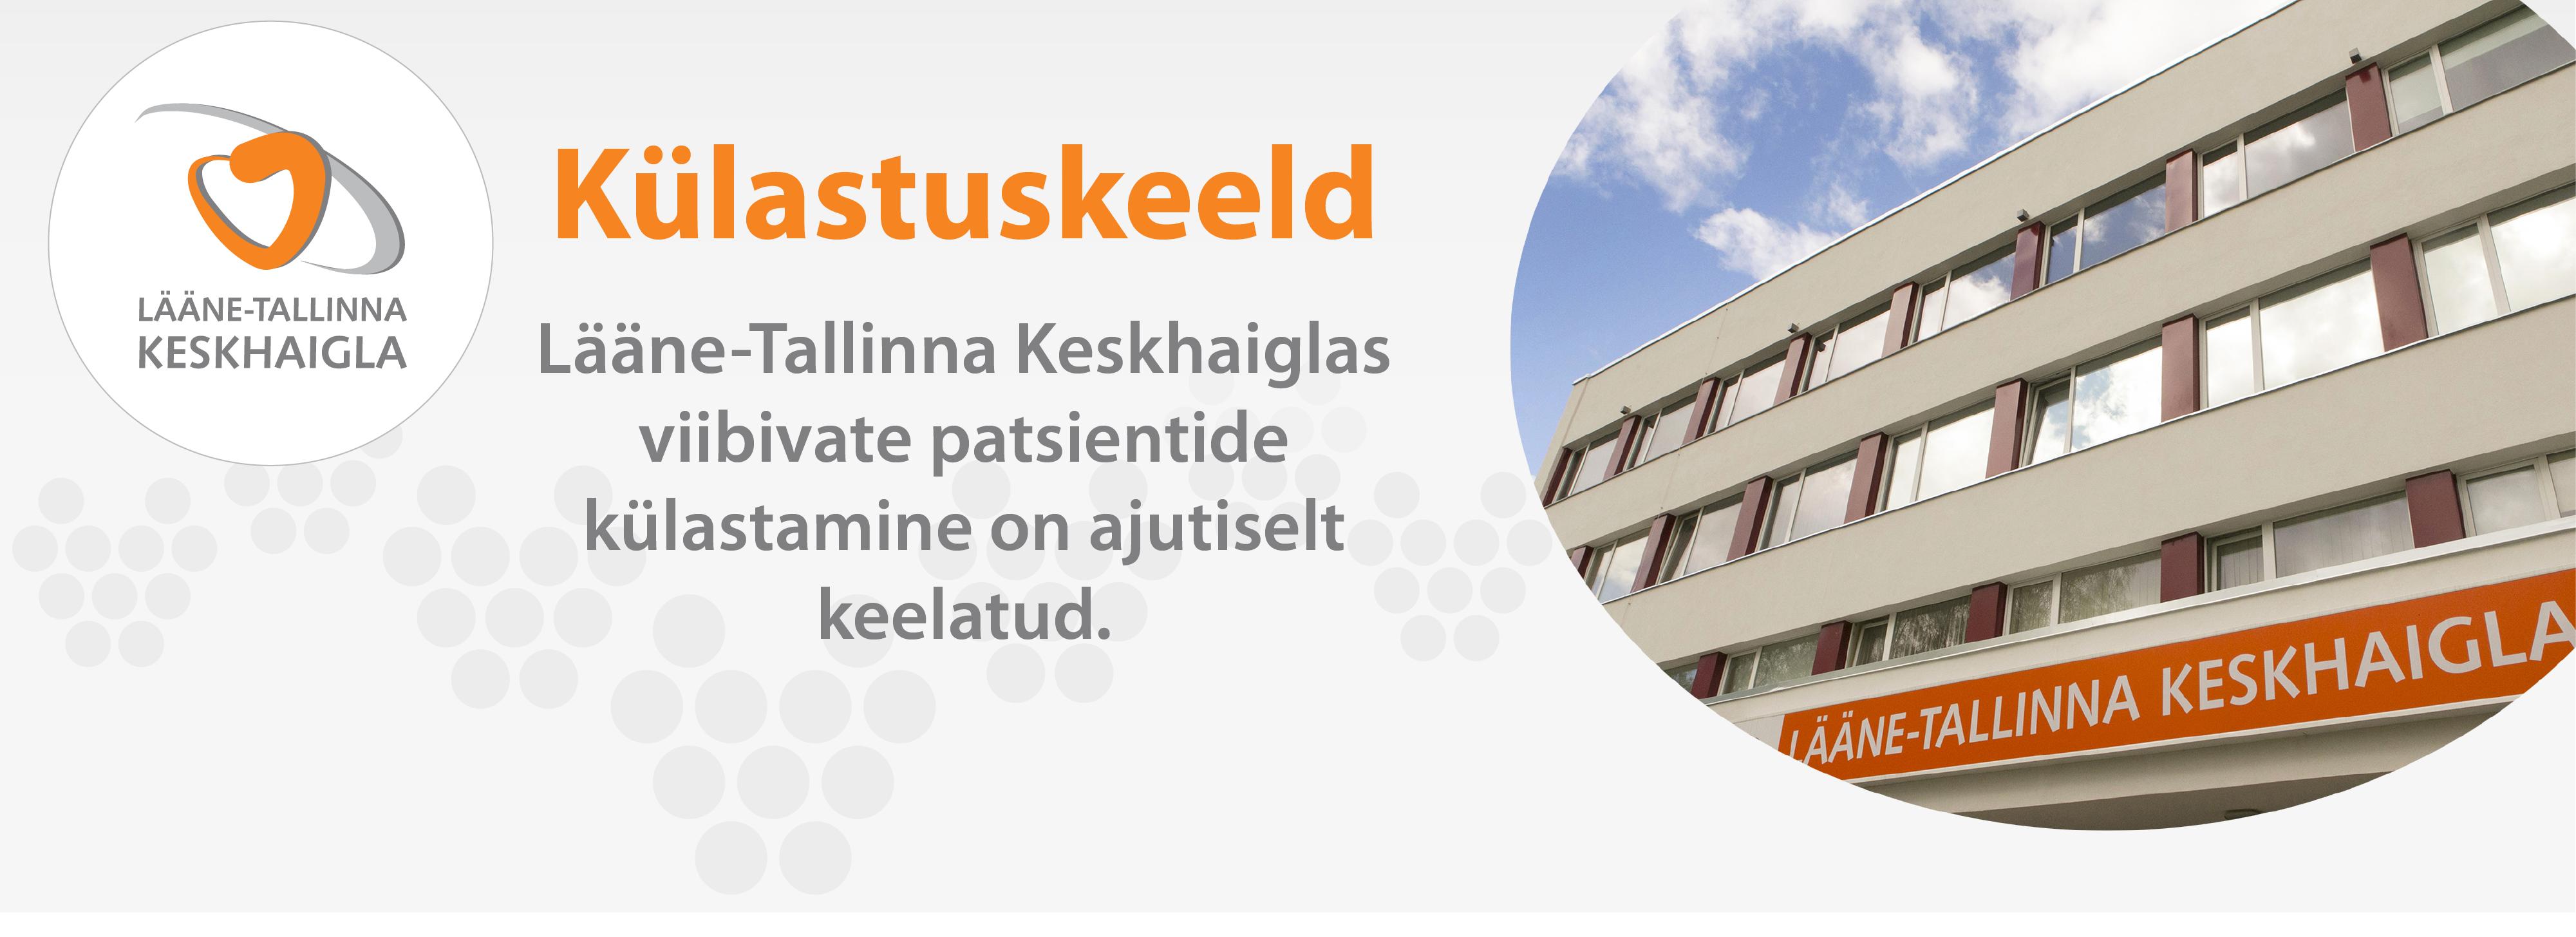 slider_kylastuskeeld-2-LTKH-EST